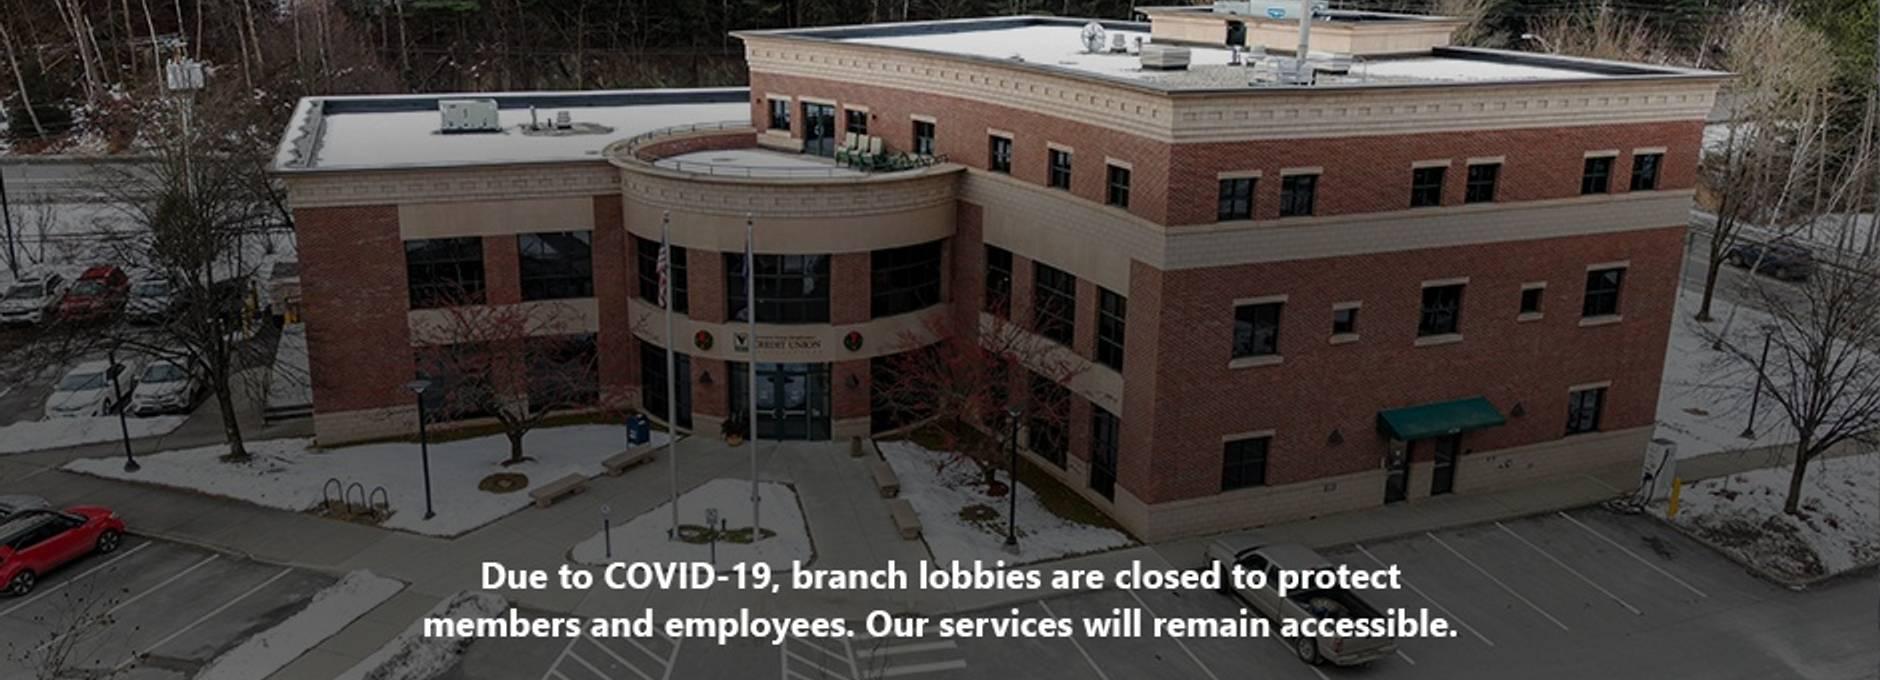 COVID-19 Lobby Closure Homepage Hero